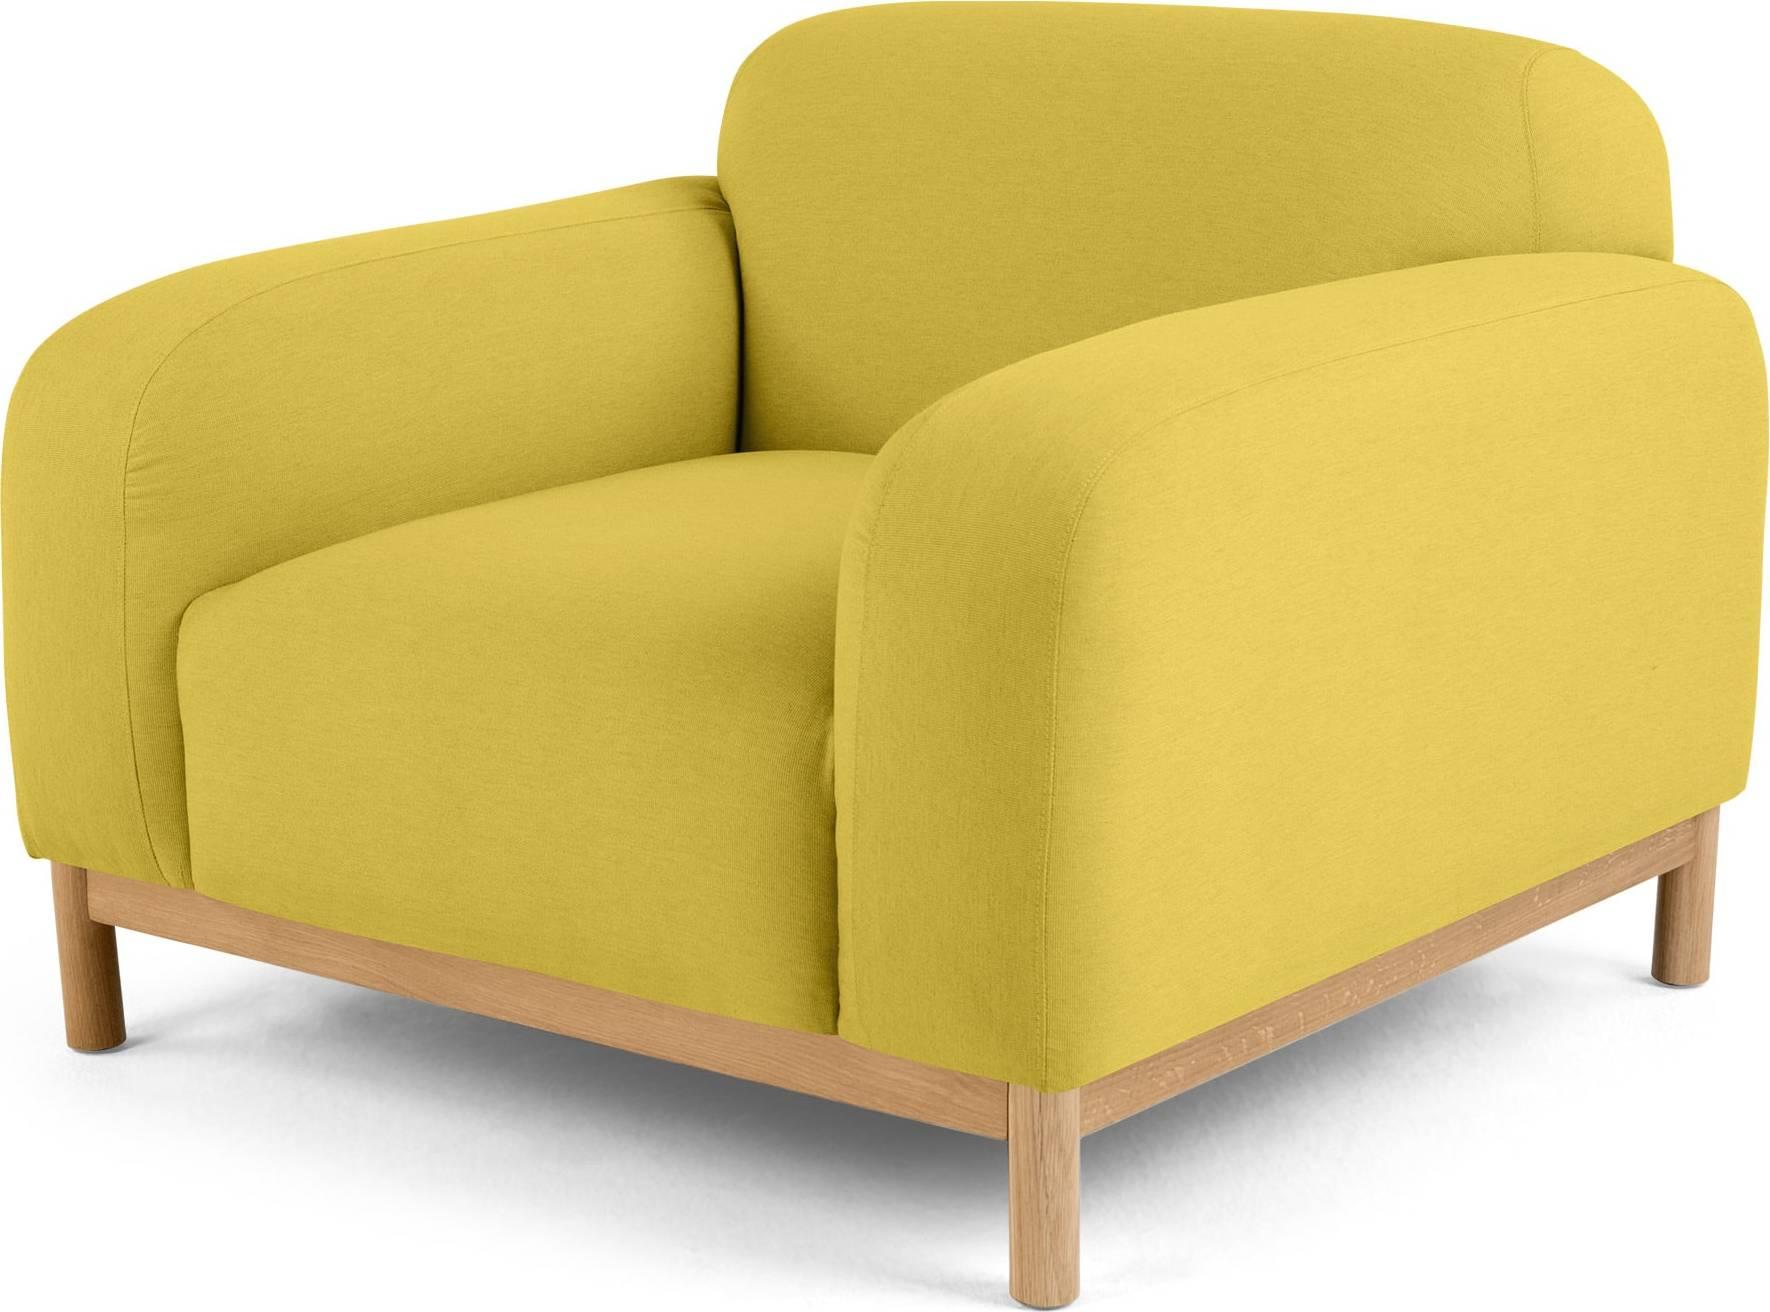 mustard yellow bean bag chair rocking harris tweed mackenzie  sofas etc